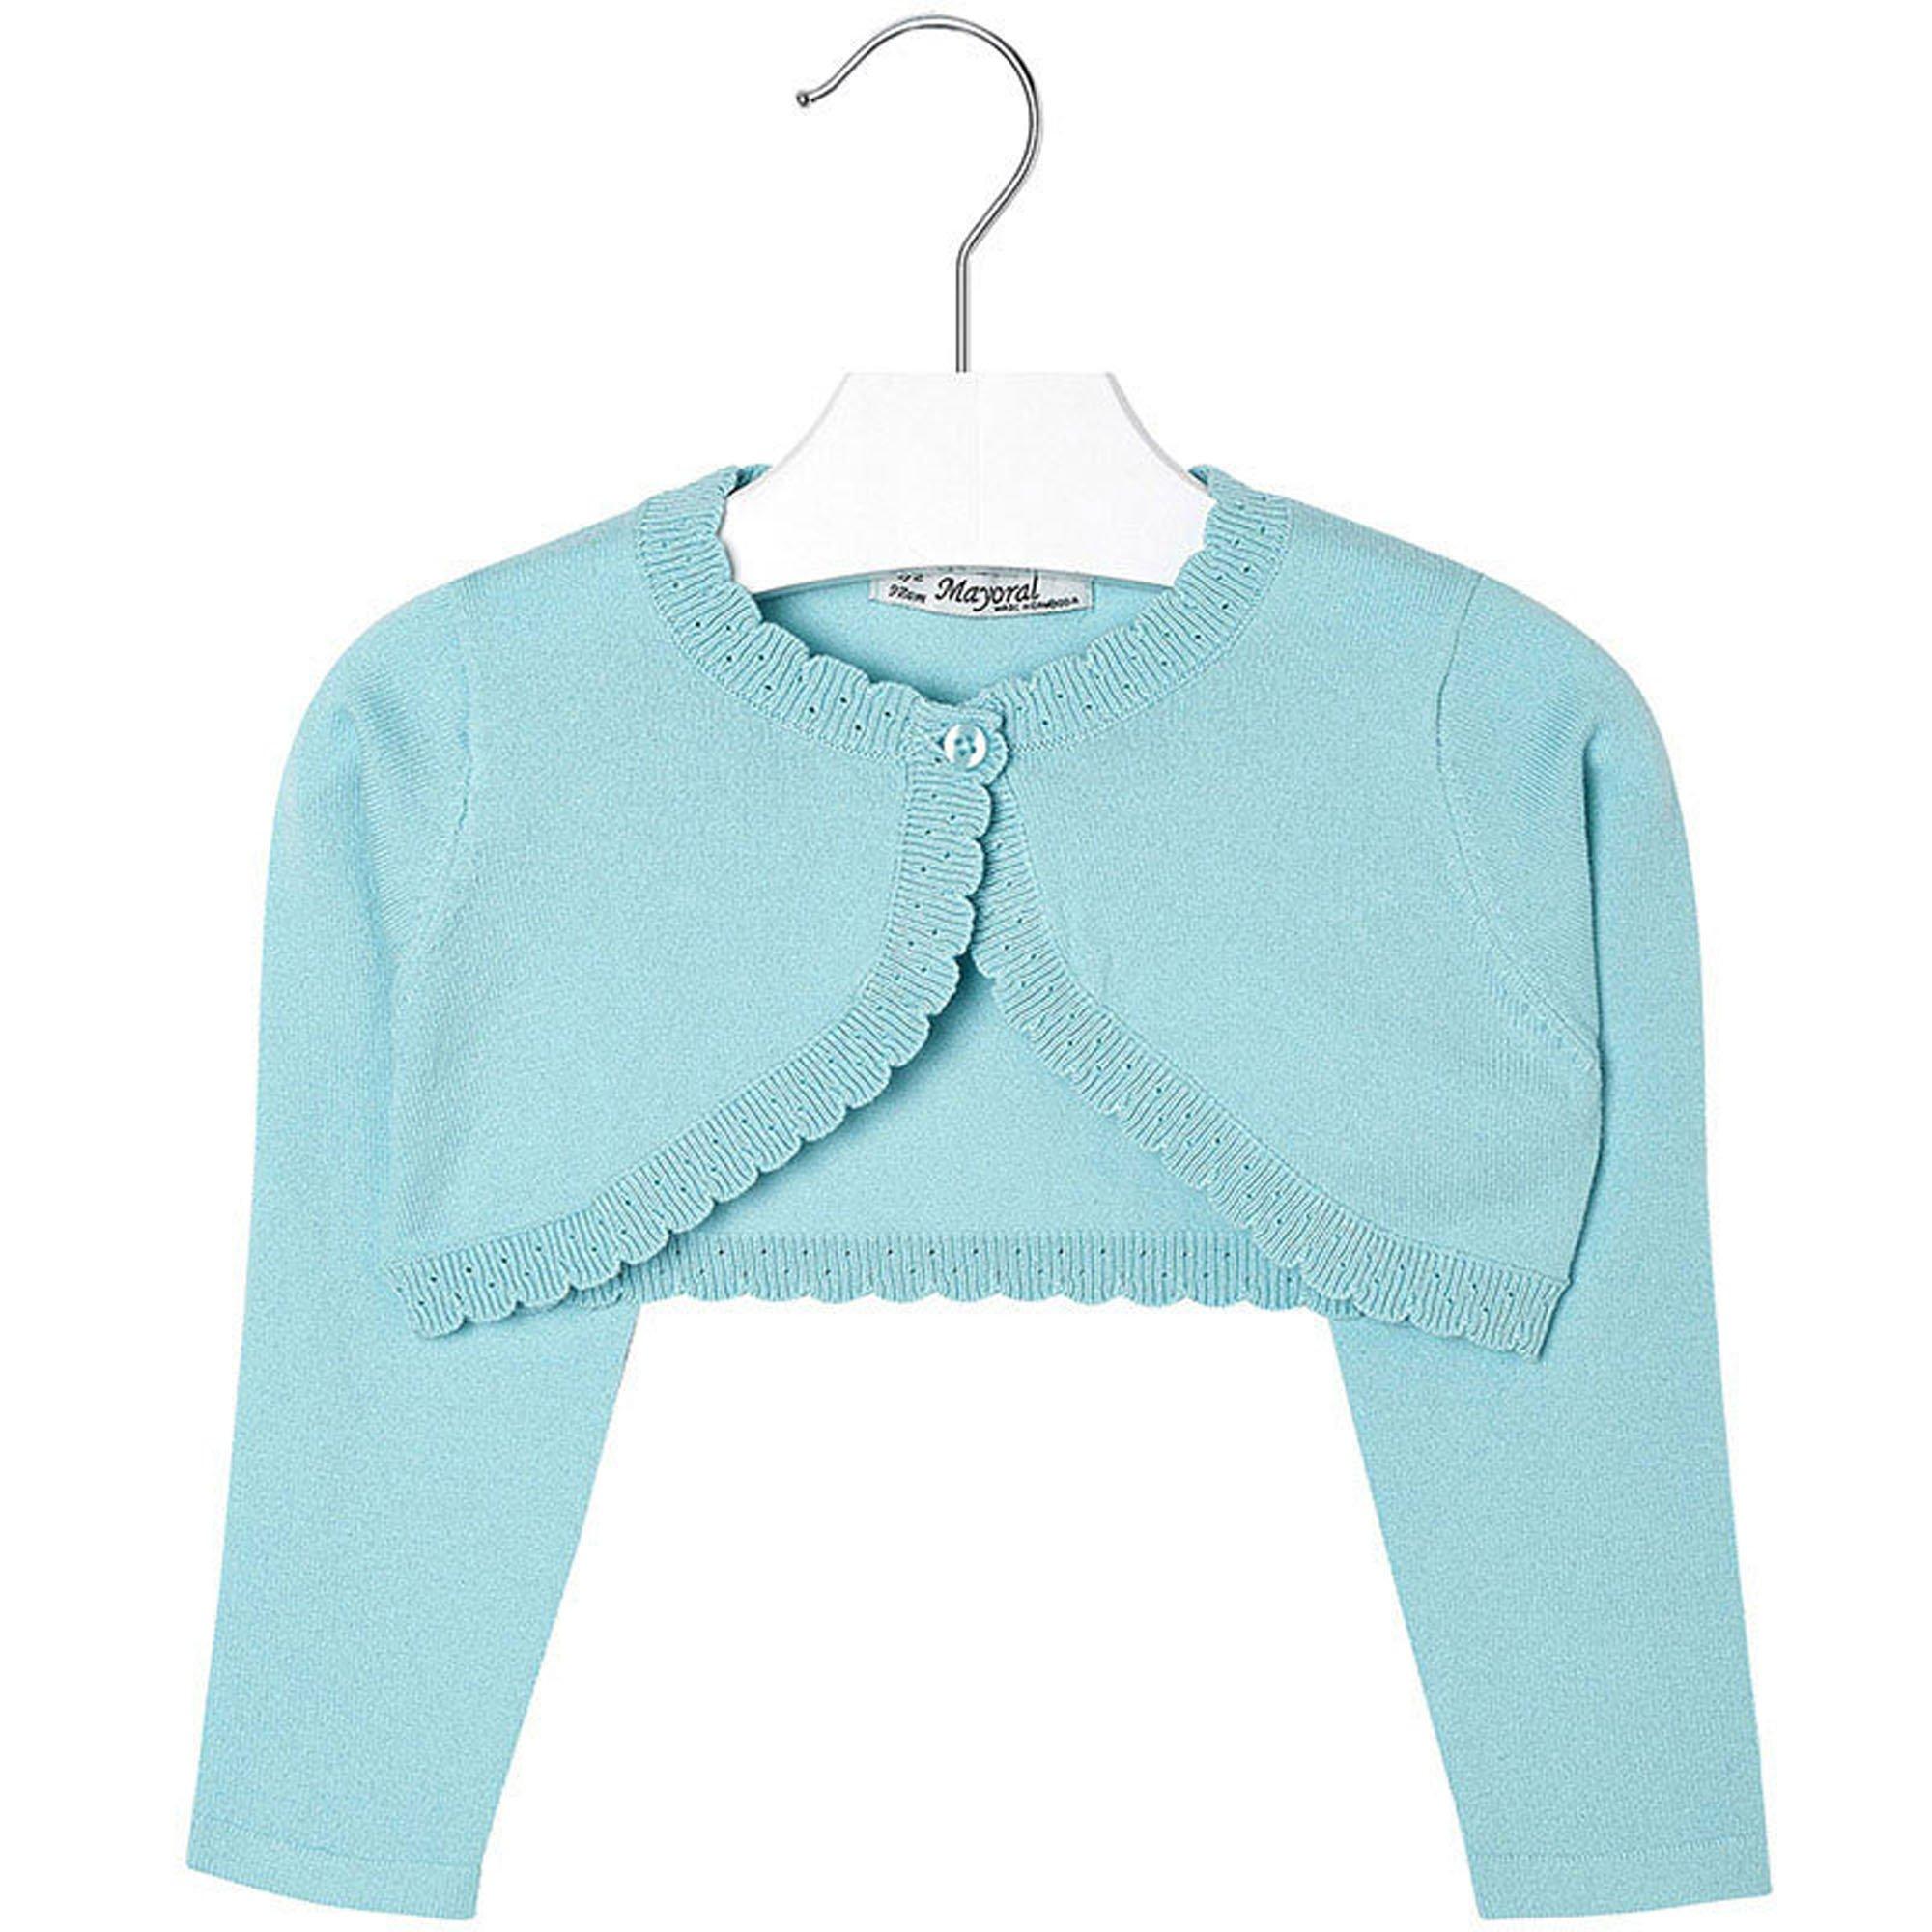 Mayoral Girls 2T-9 Aqua-Blue Scallop Edge Knit Shrug Cardigan Sweater, Aqua,4